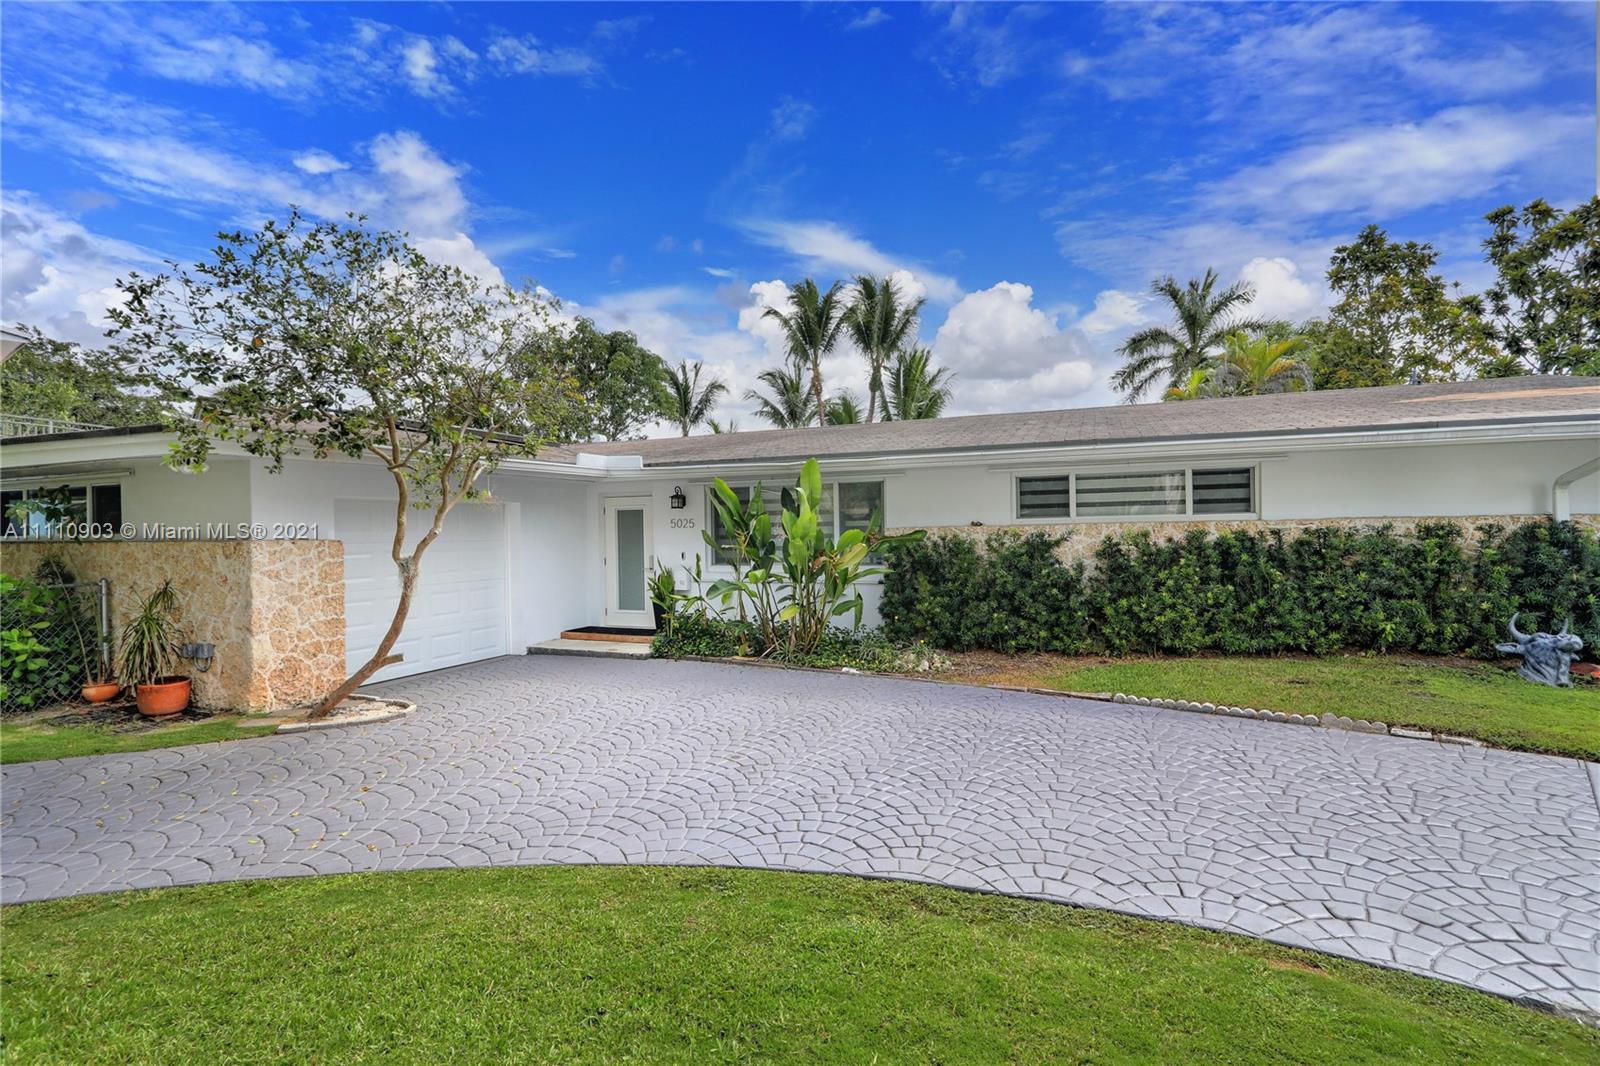 Single Family Home,For Sale,5025 SW 65th Ave, Miami, Florida 33155,Brickell,realty,broker,condos near me